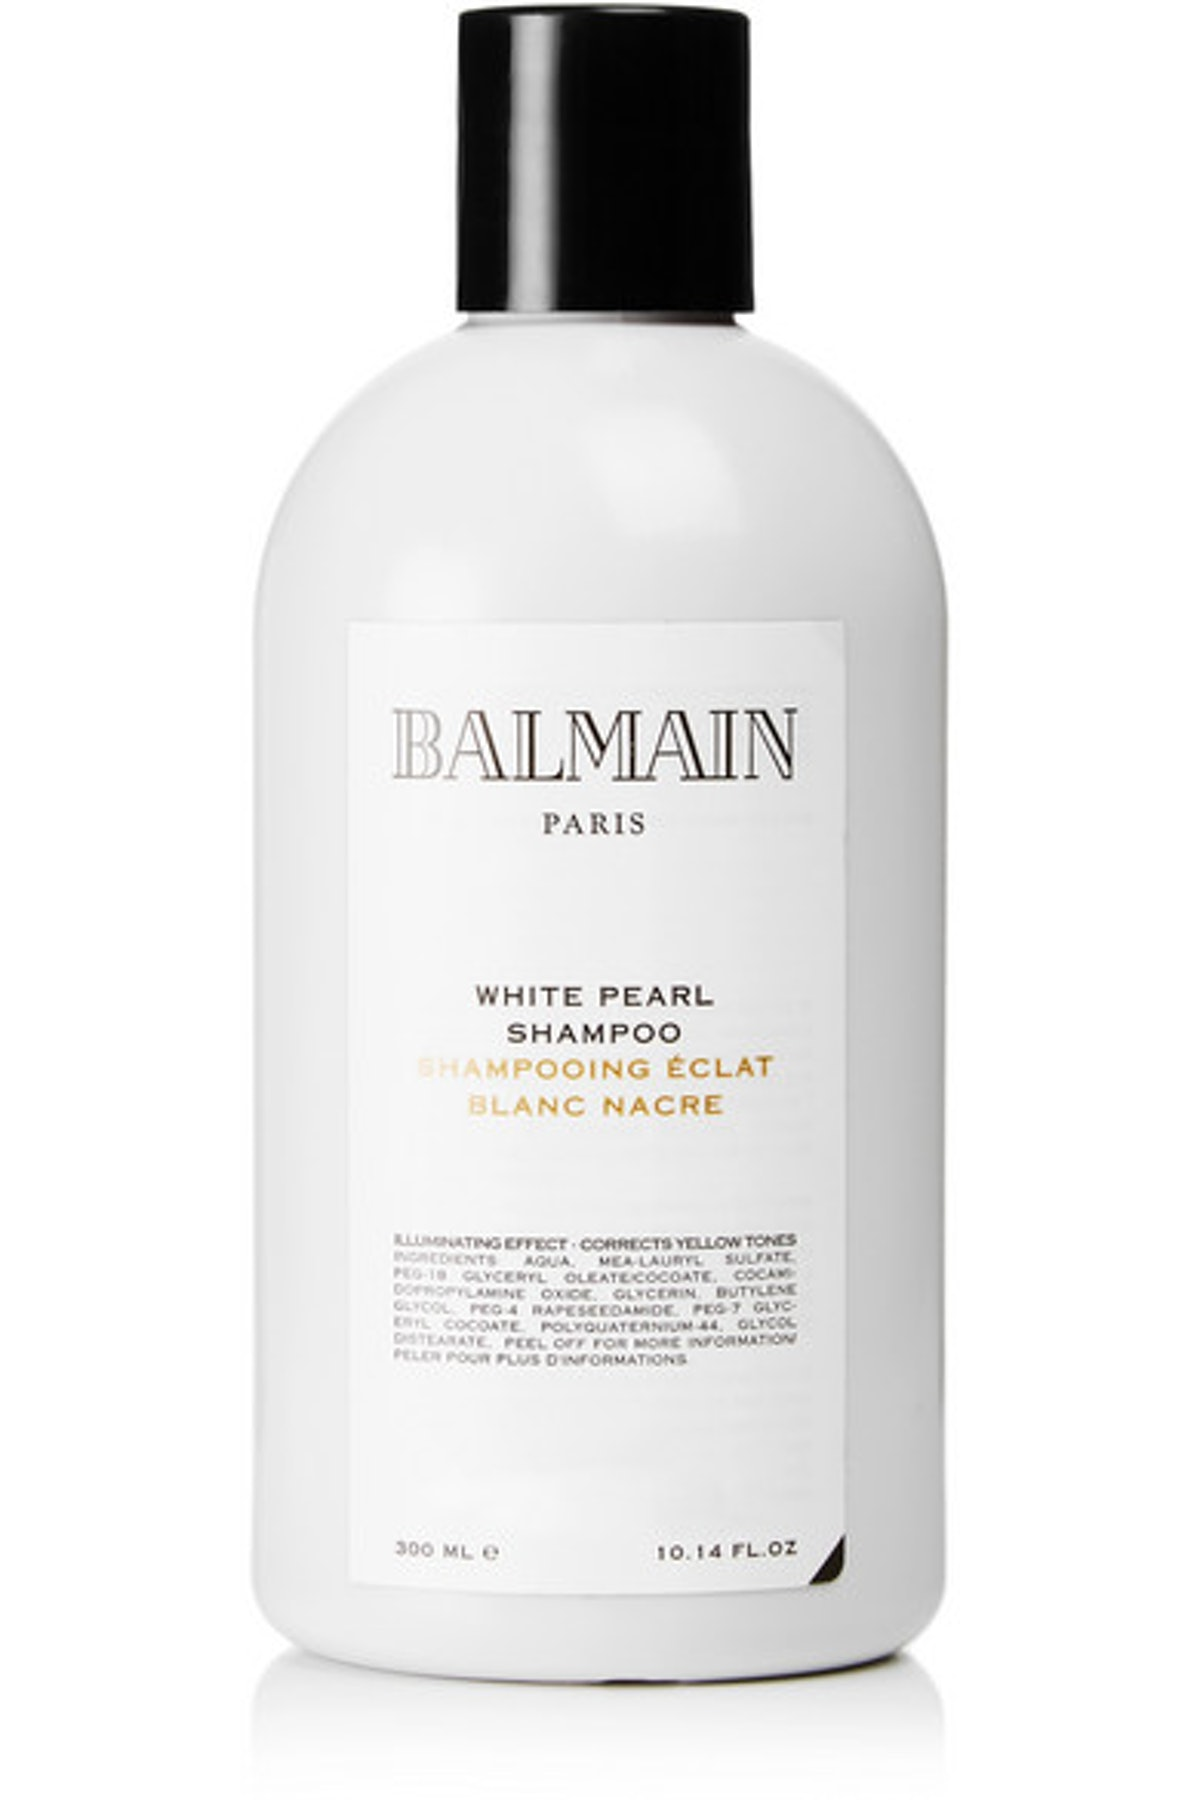 White Pearl Shampoo